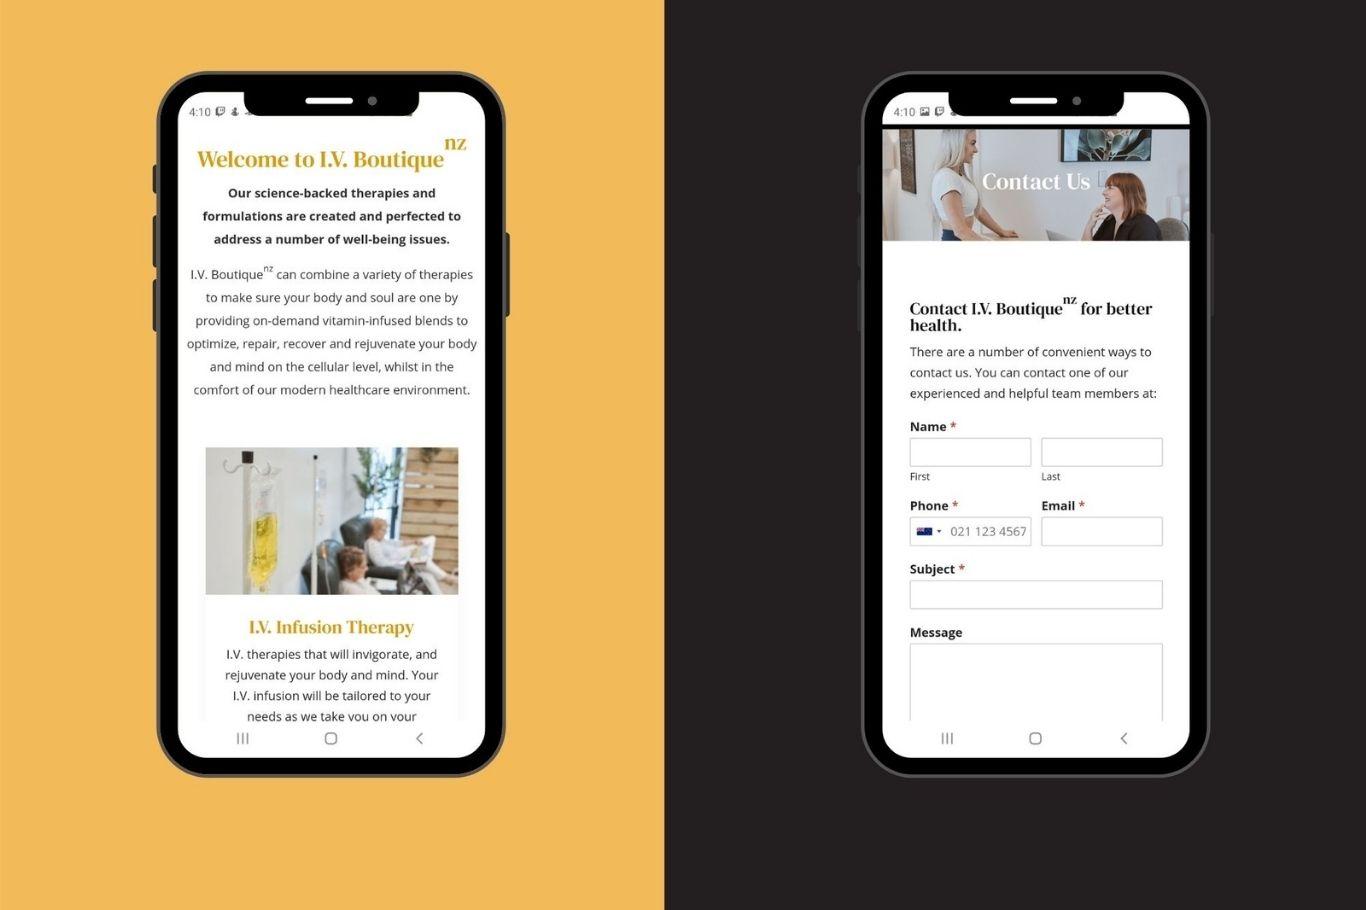 iv boutique mobile optimised website development cloud media latest